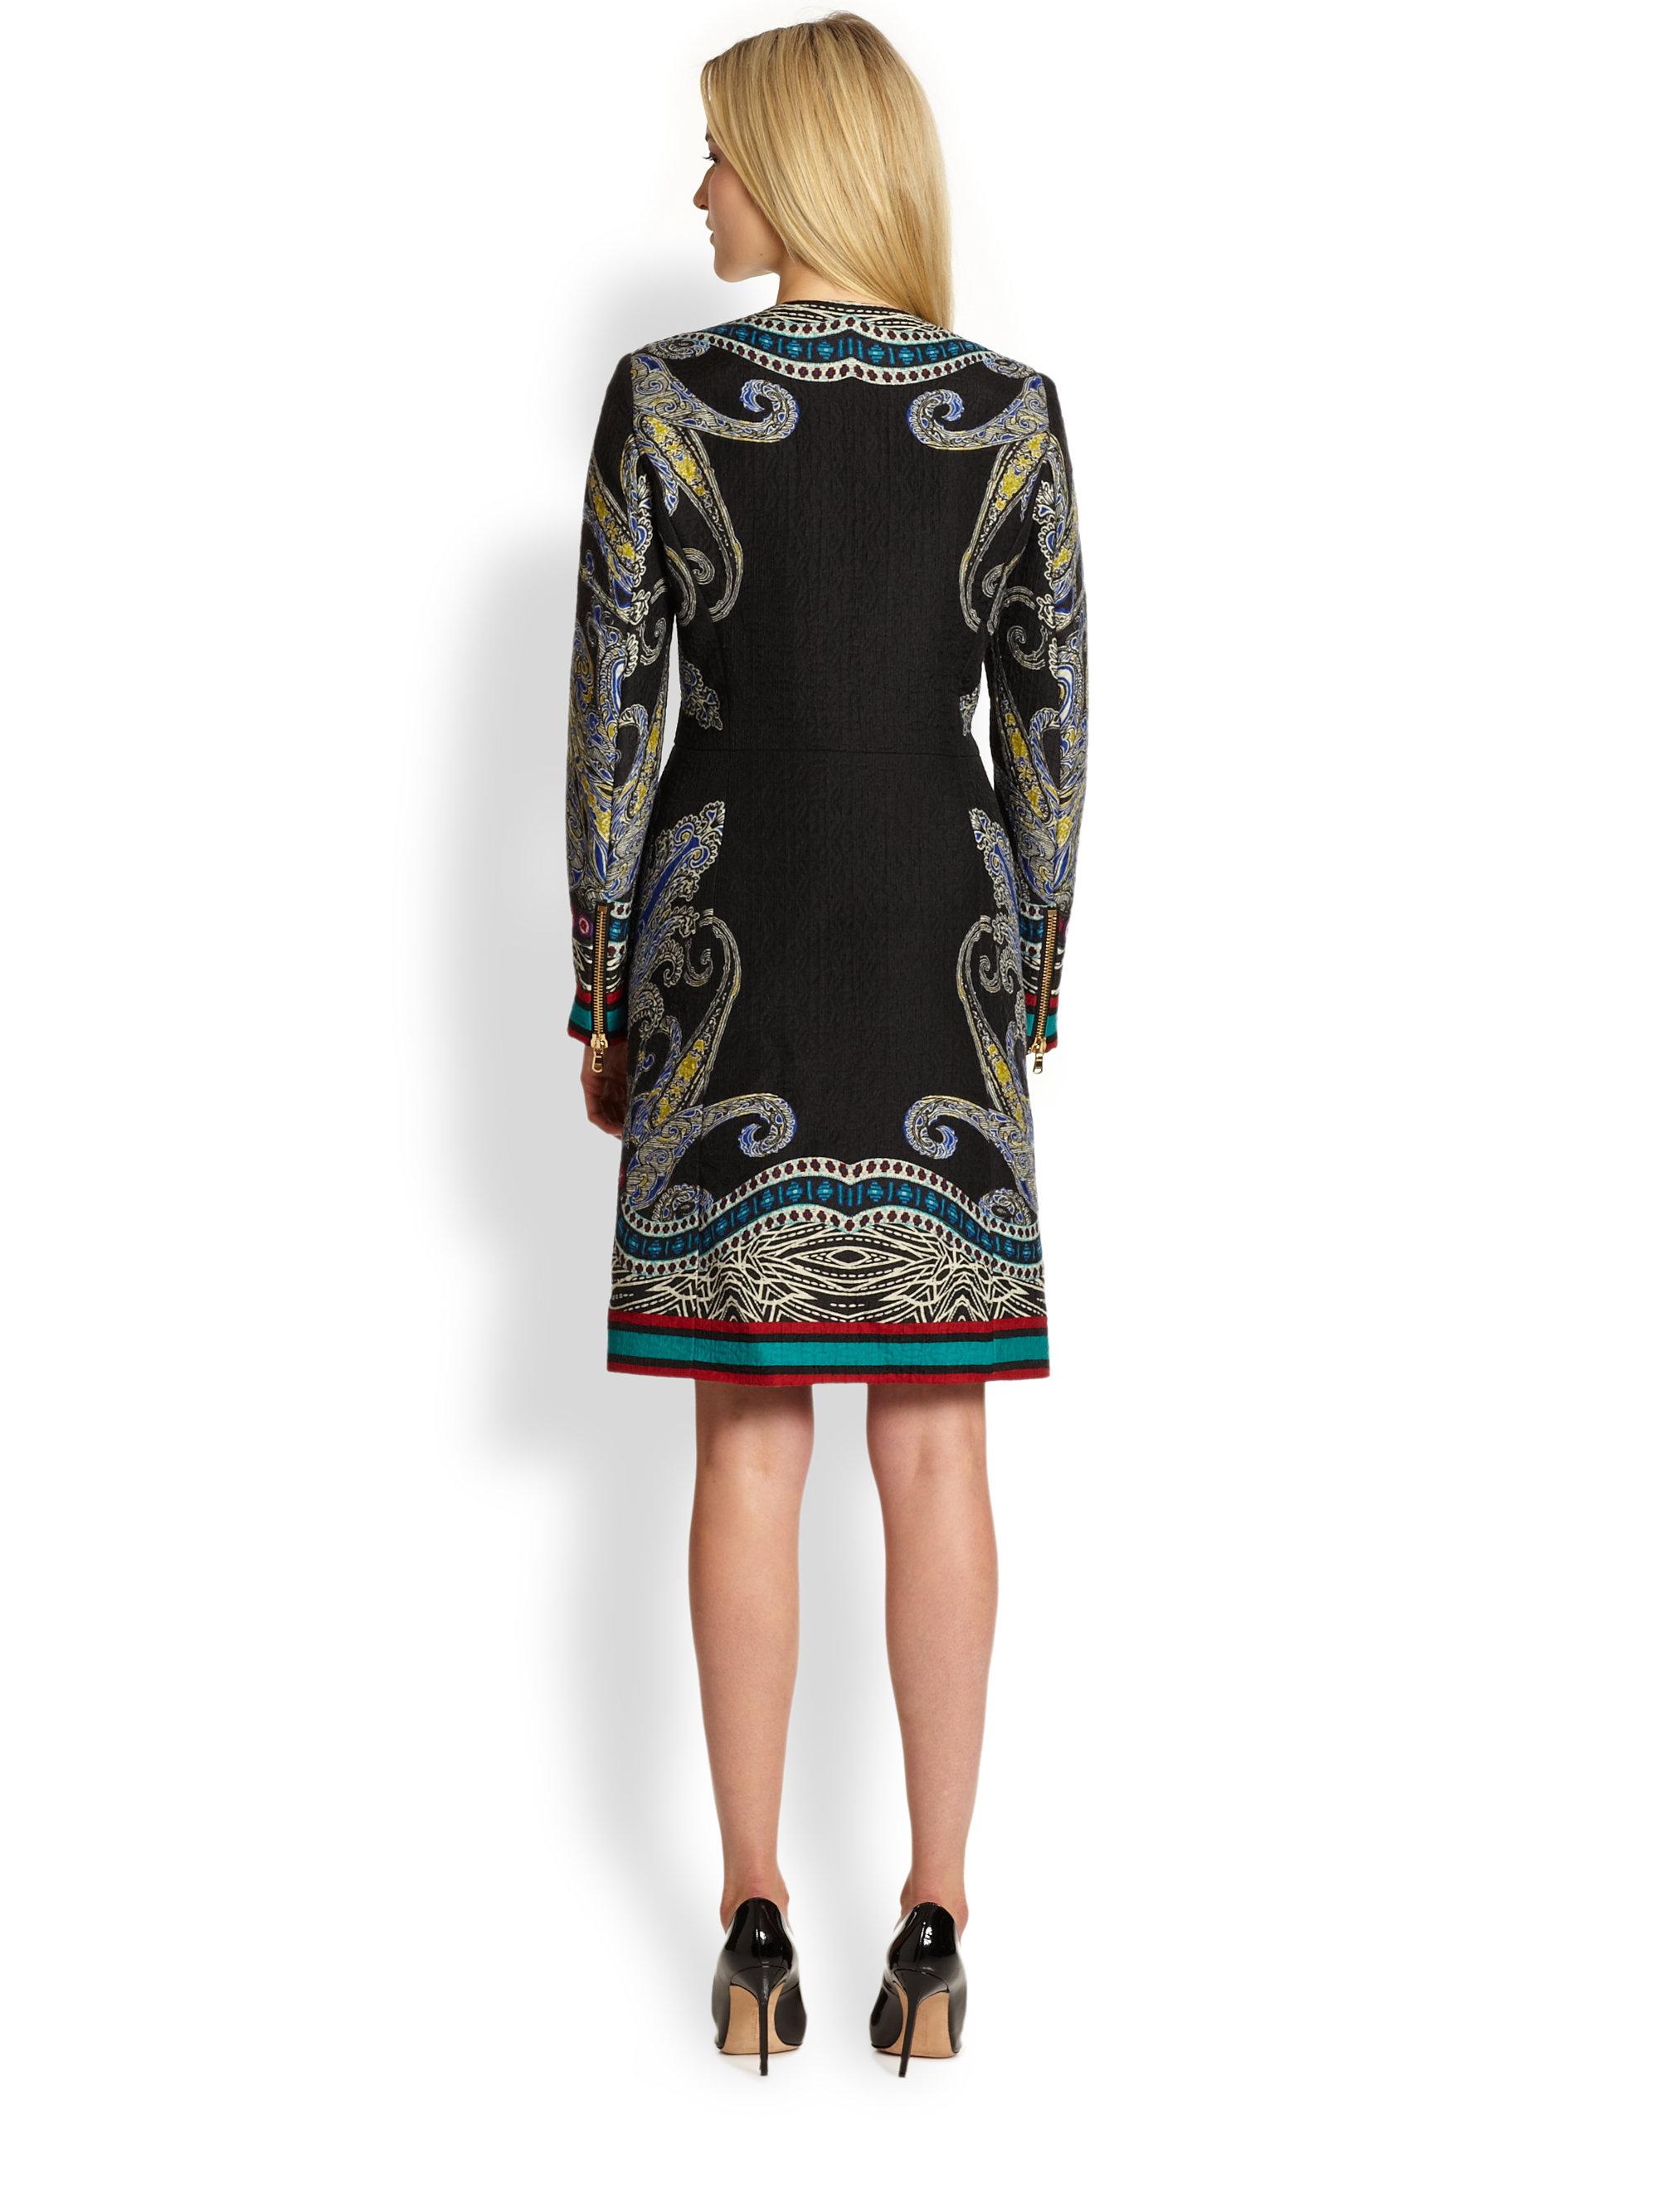 ef4dd140e6 etro-black -multi-wool-matelasse-printed-coat-dress-product-2-12845734-005649335.jpeg